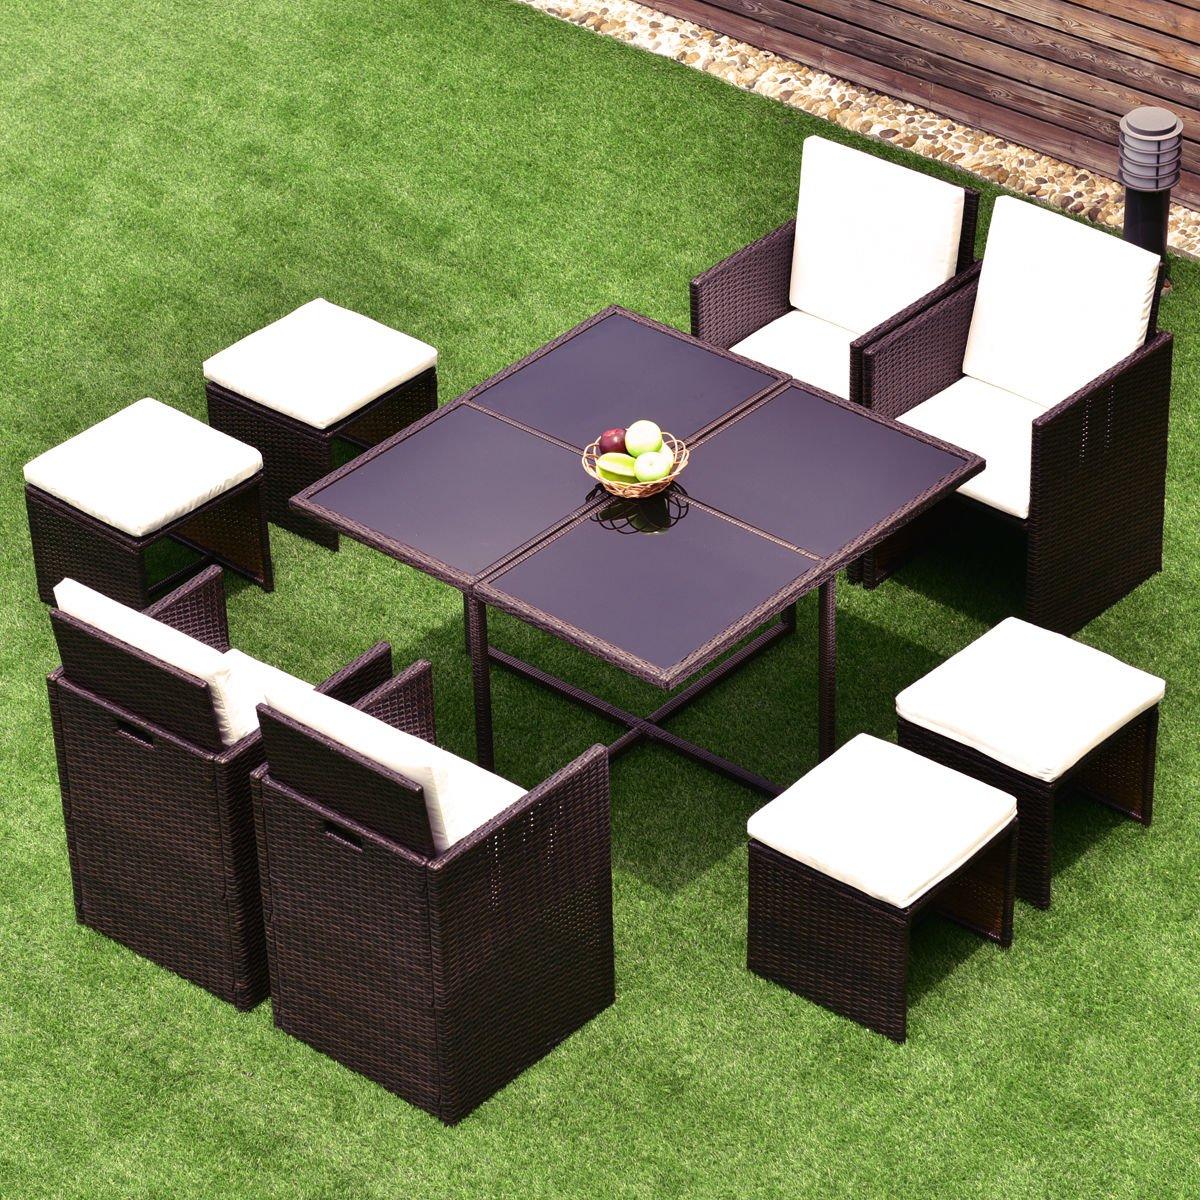 Amazon Com Directsale 9 Pcs Wicker Rattan Cube Garden Furniture